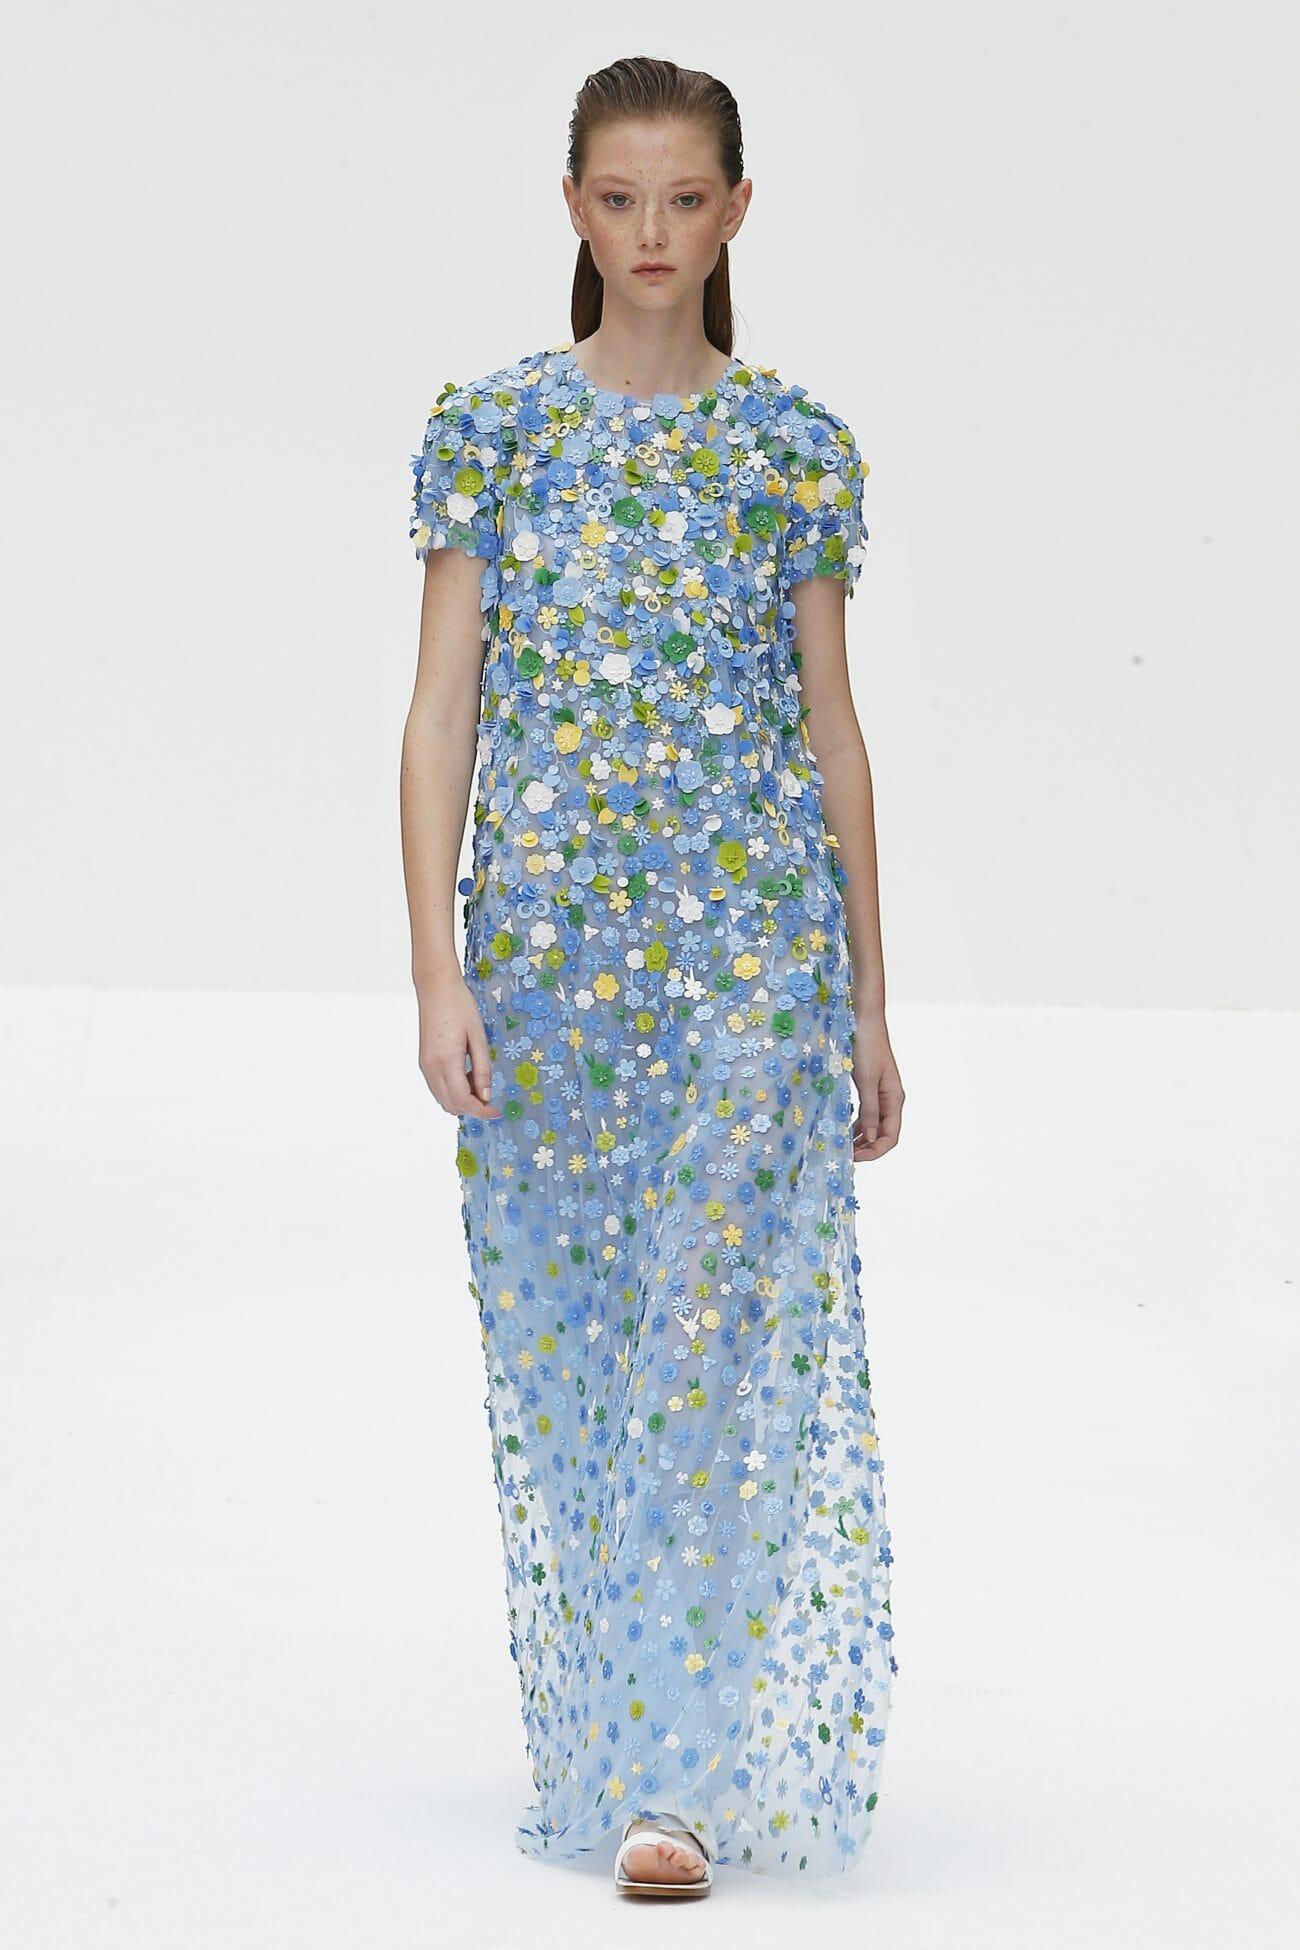 Carolina Herrera New York floral dress